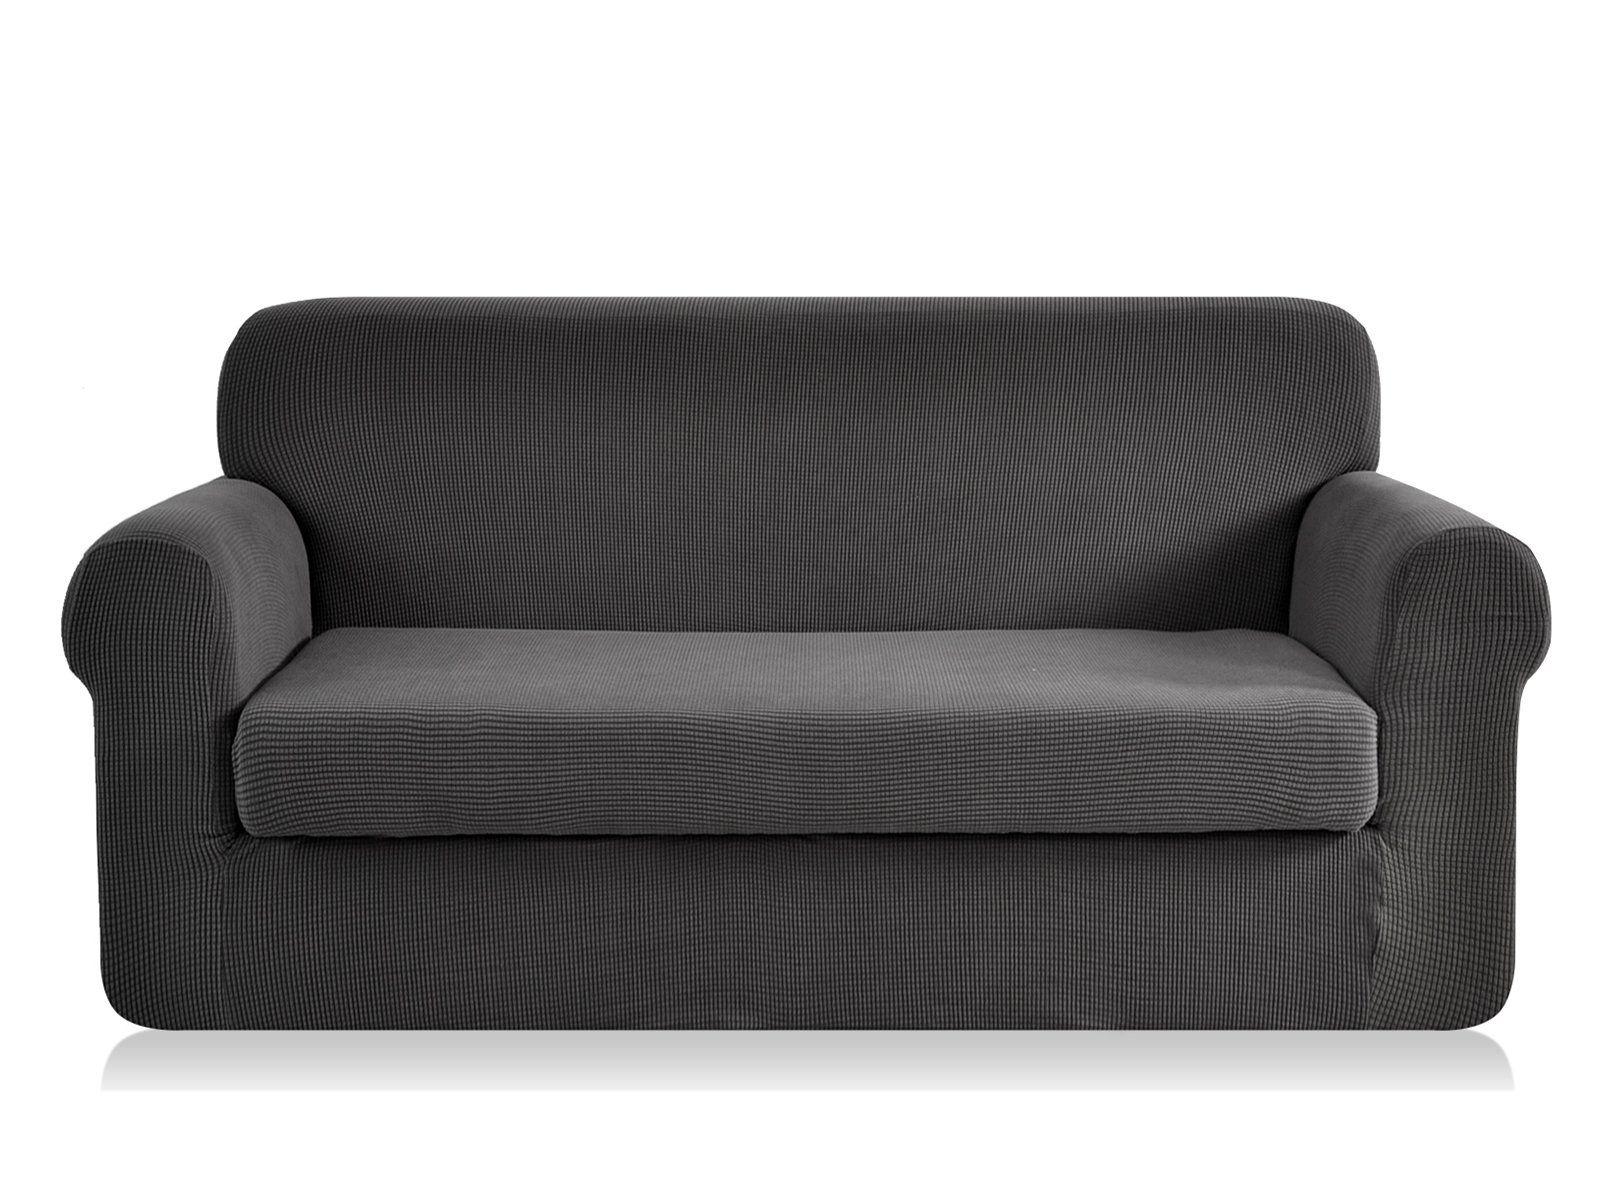 Chun yi jacquard oversize sofa covers 2piece stretch